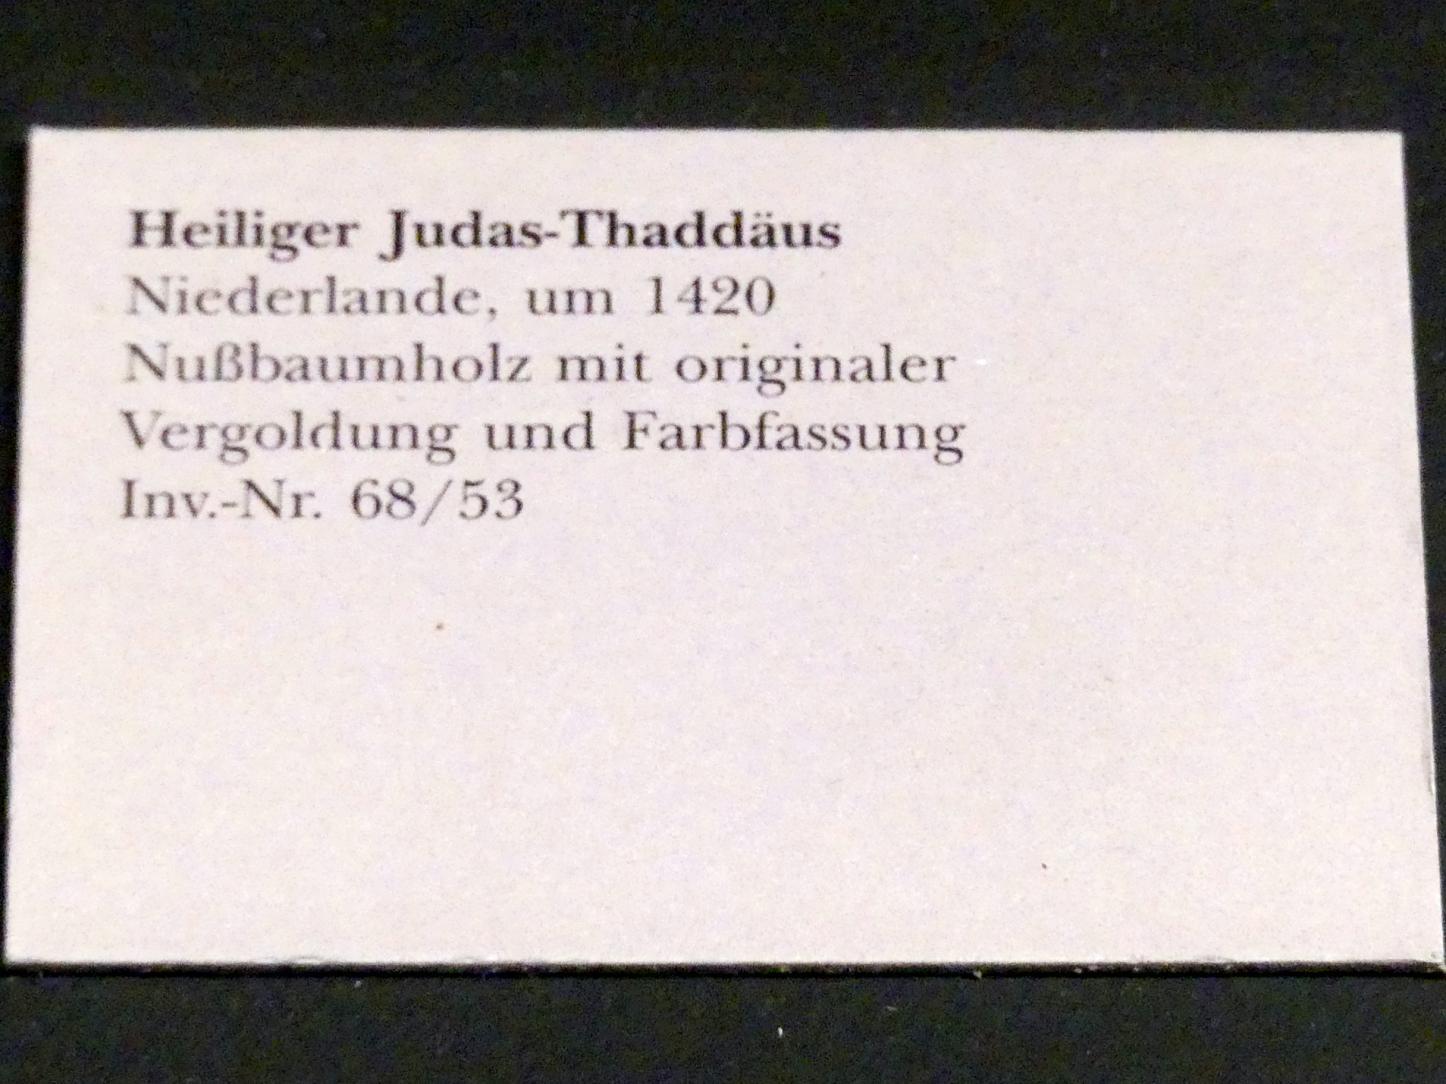 Heiliger Judas Thaddäus, um 1420, Bild 3/3